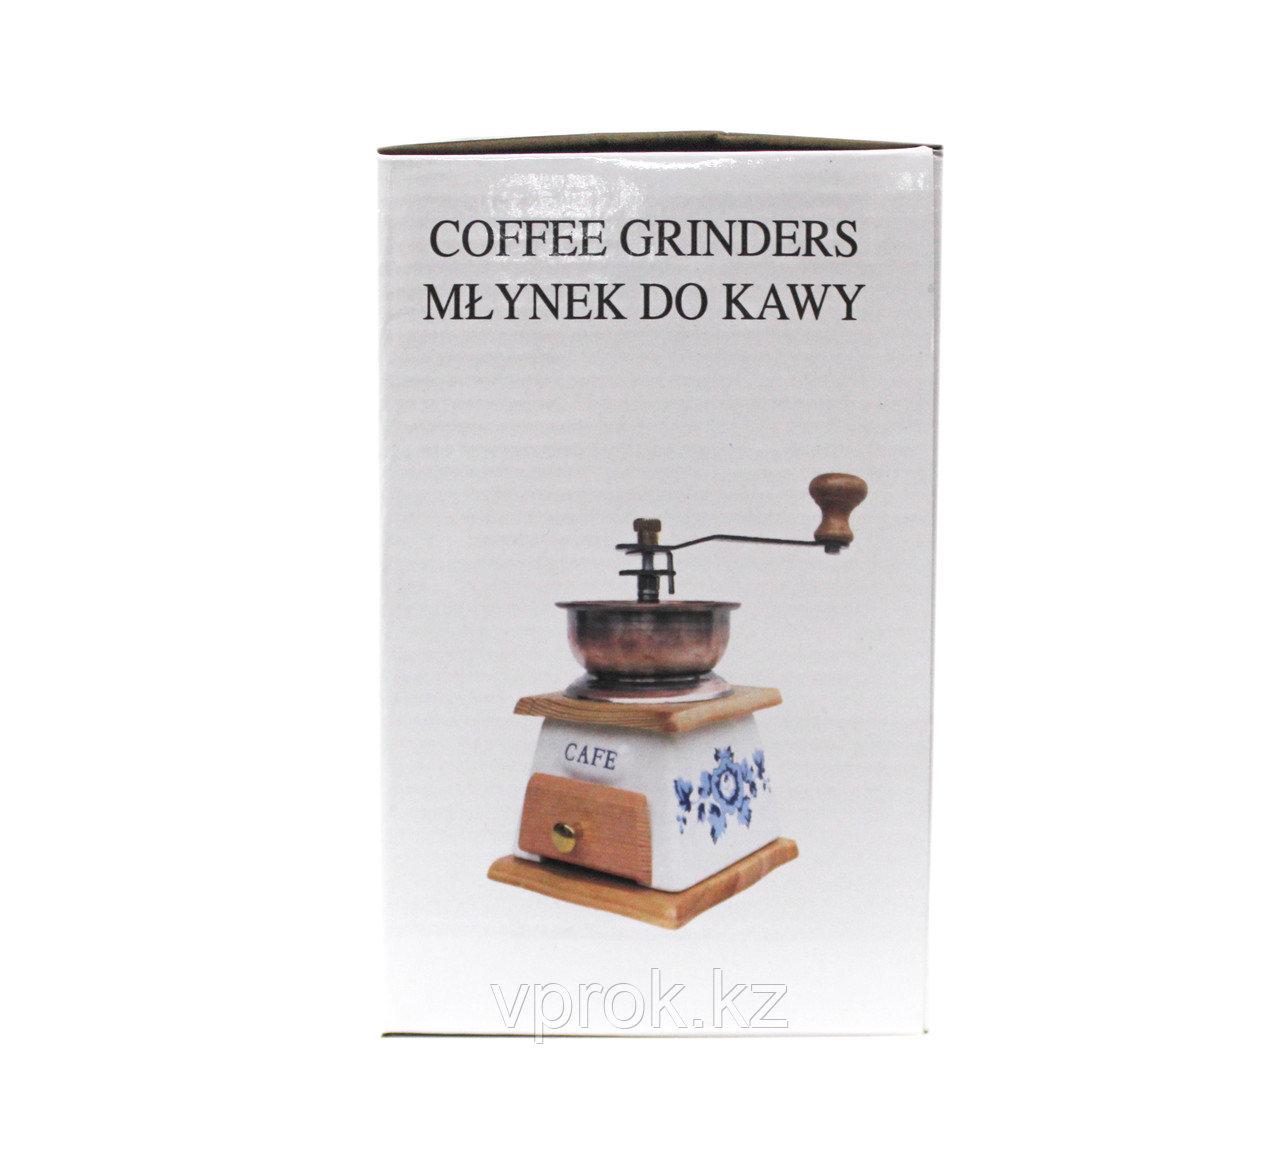 Кофемолка ручная, красное дерево, 30x25x30см - фото 5